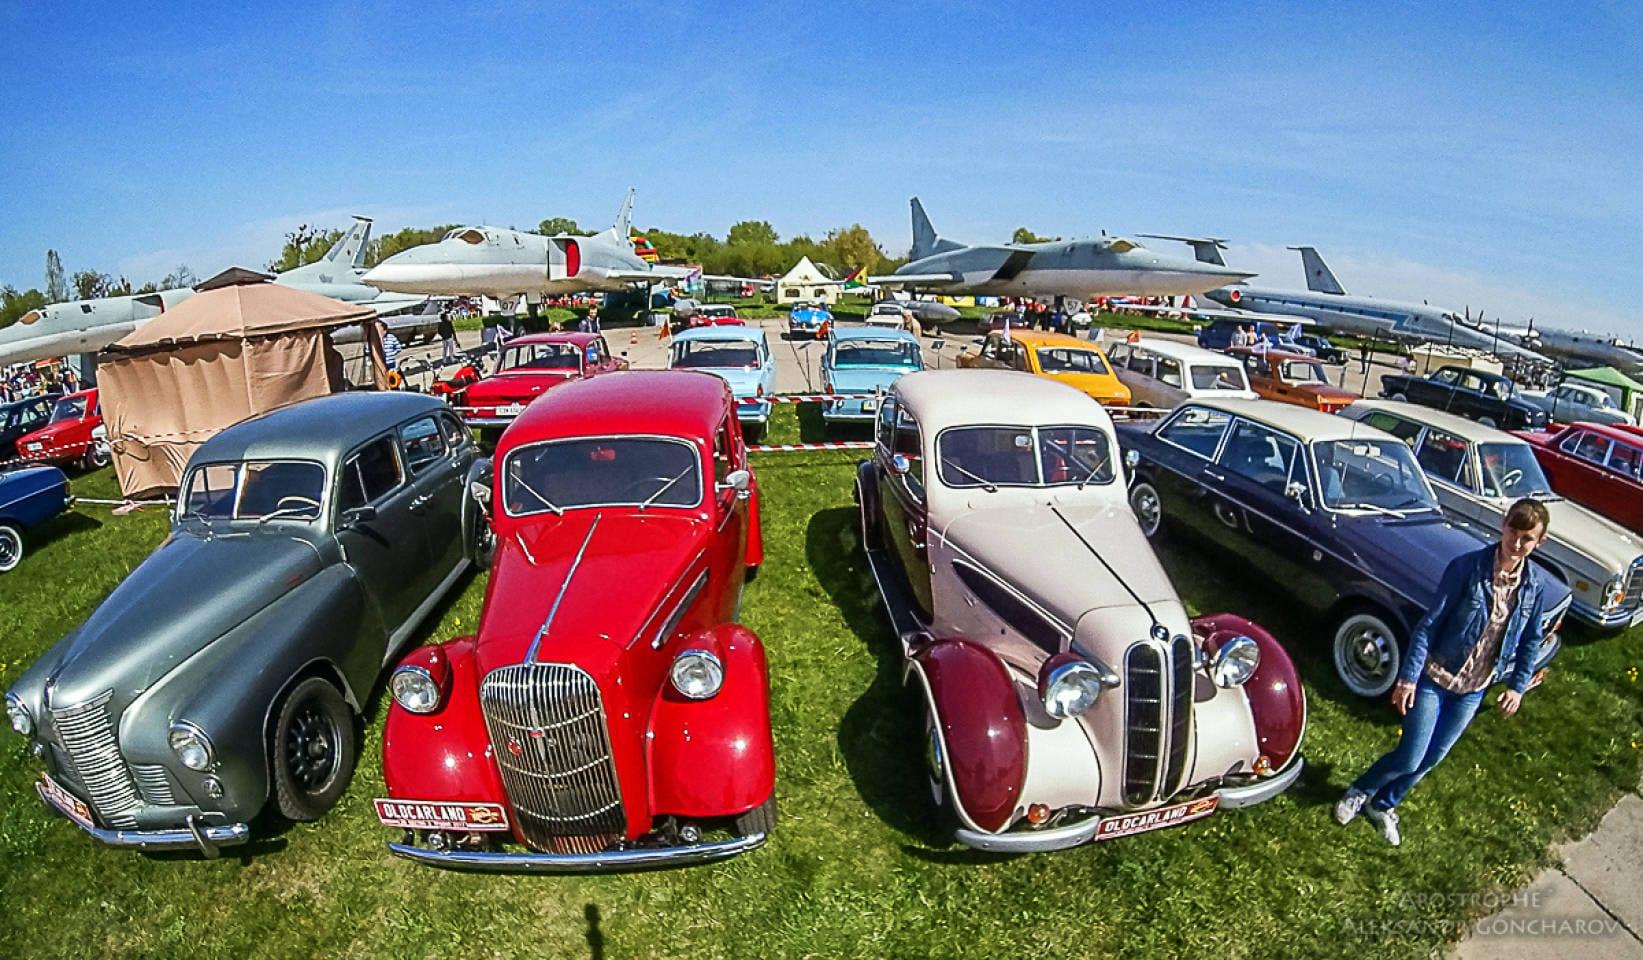 festival-texniki-old-car-land-2019